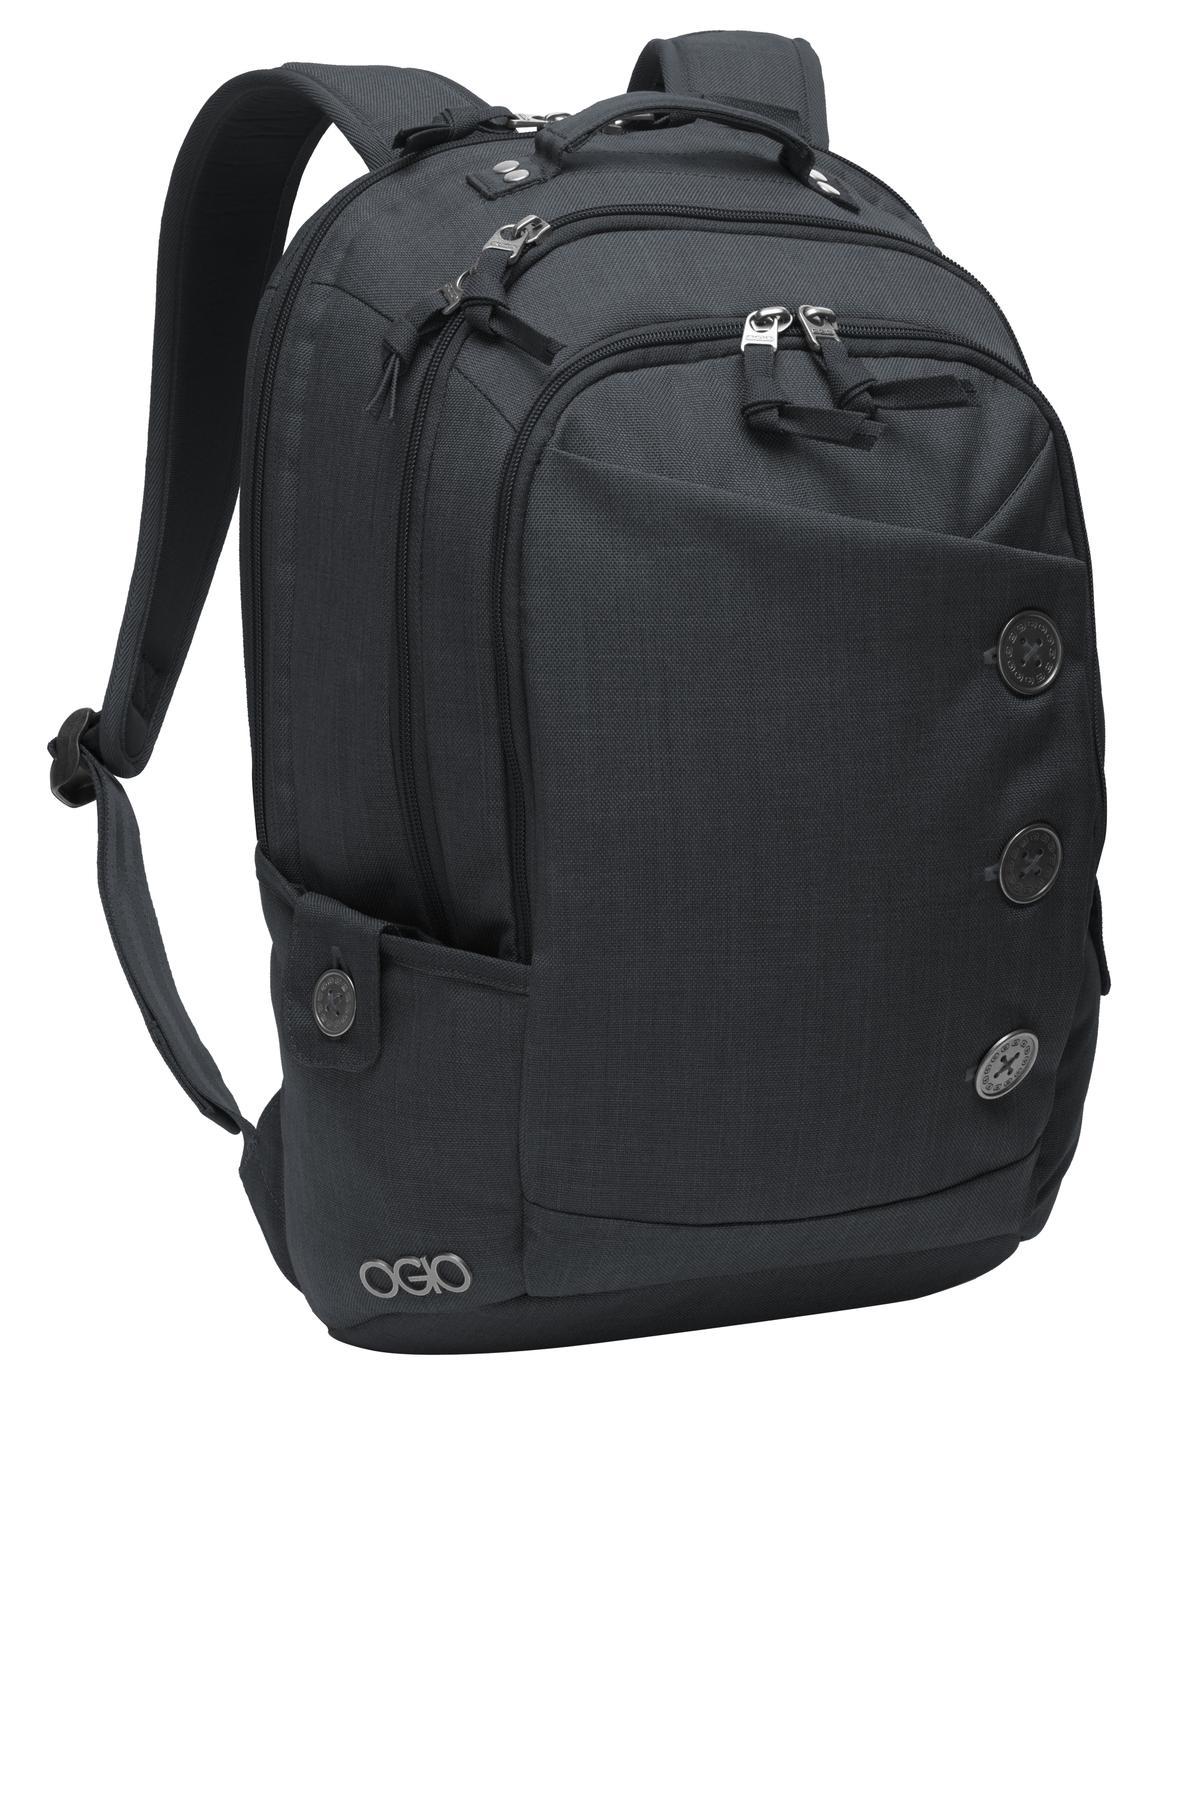 OGIO 414004 - Ladies Melrose Pack - Bags